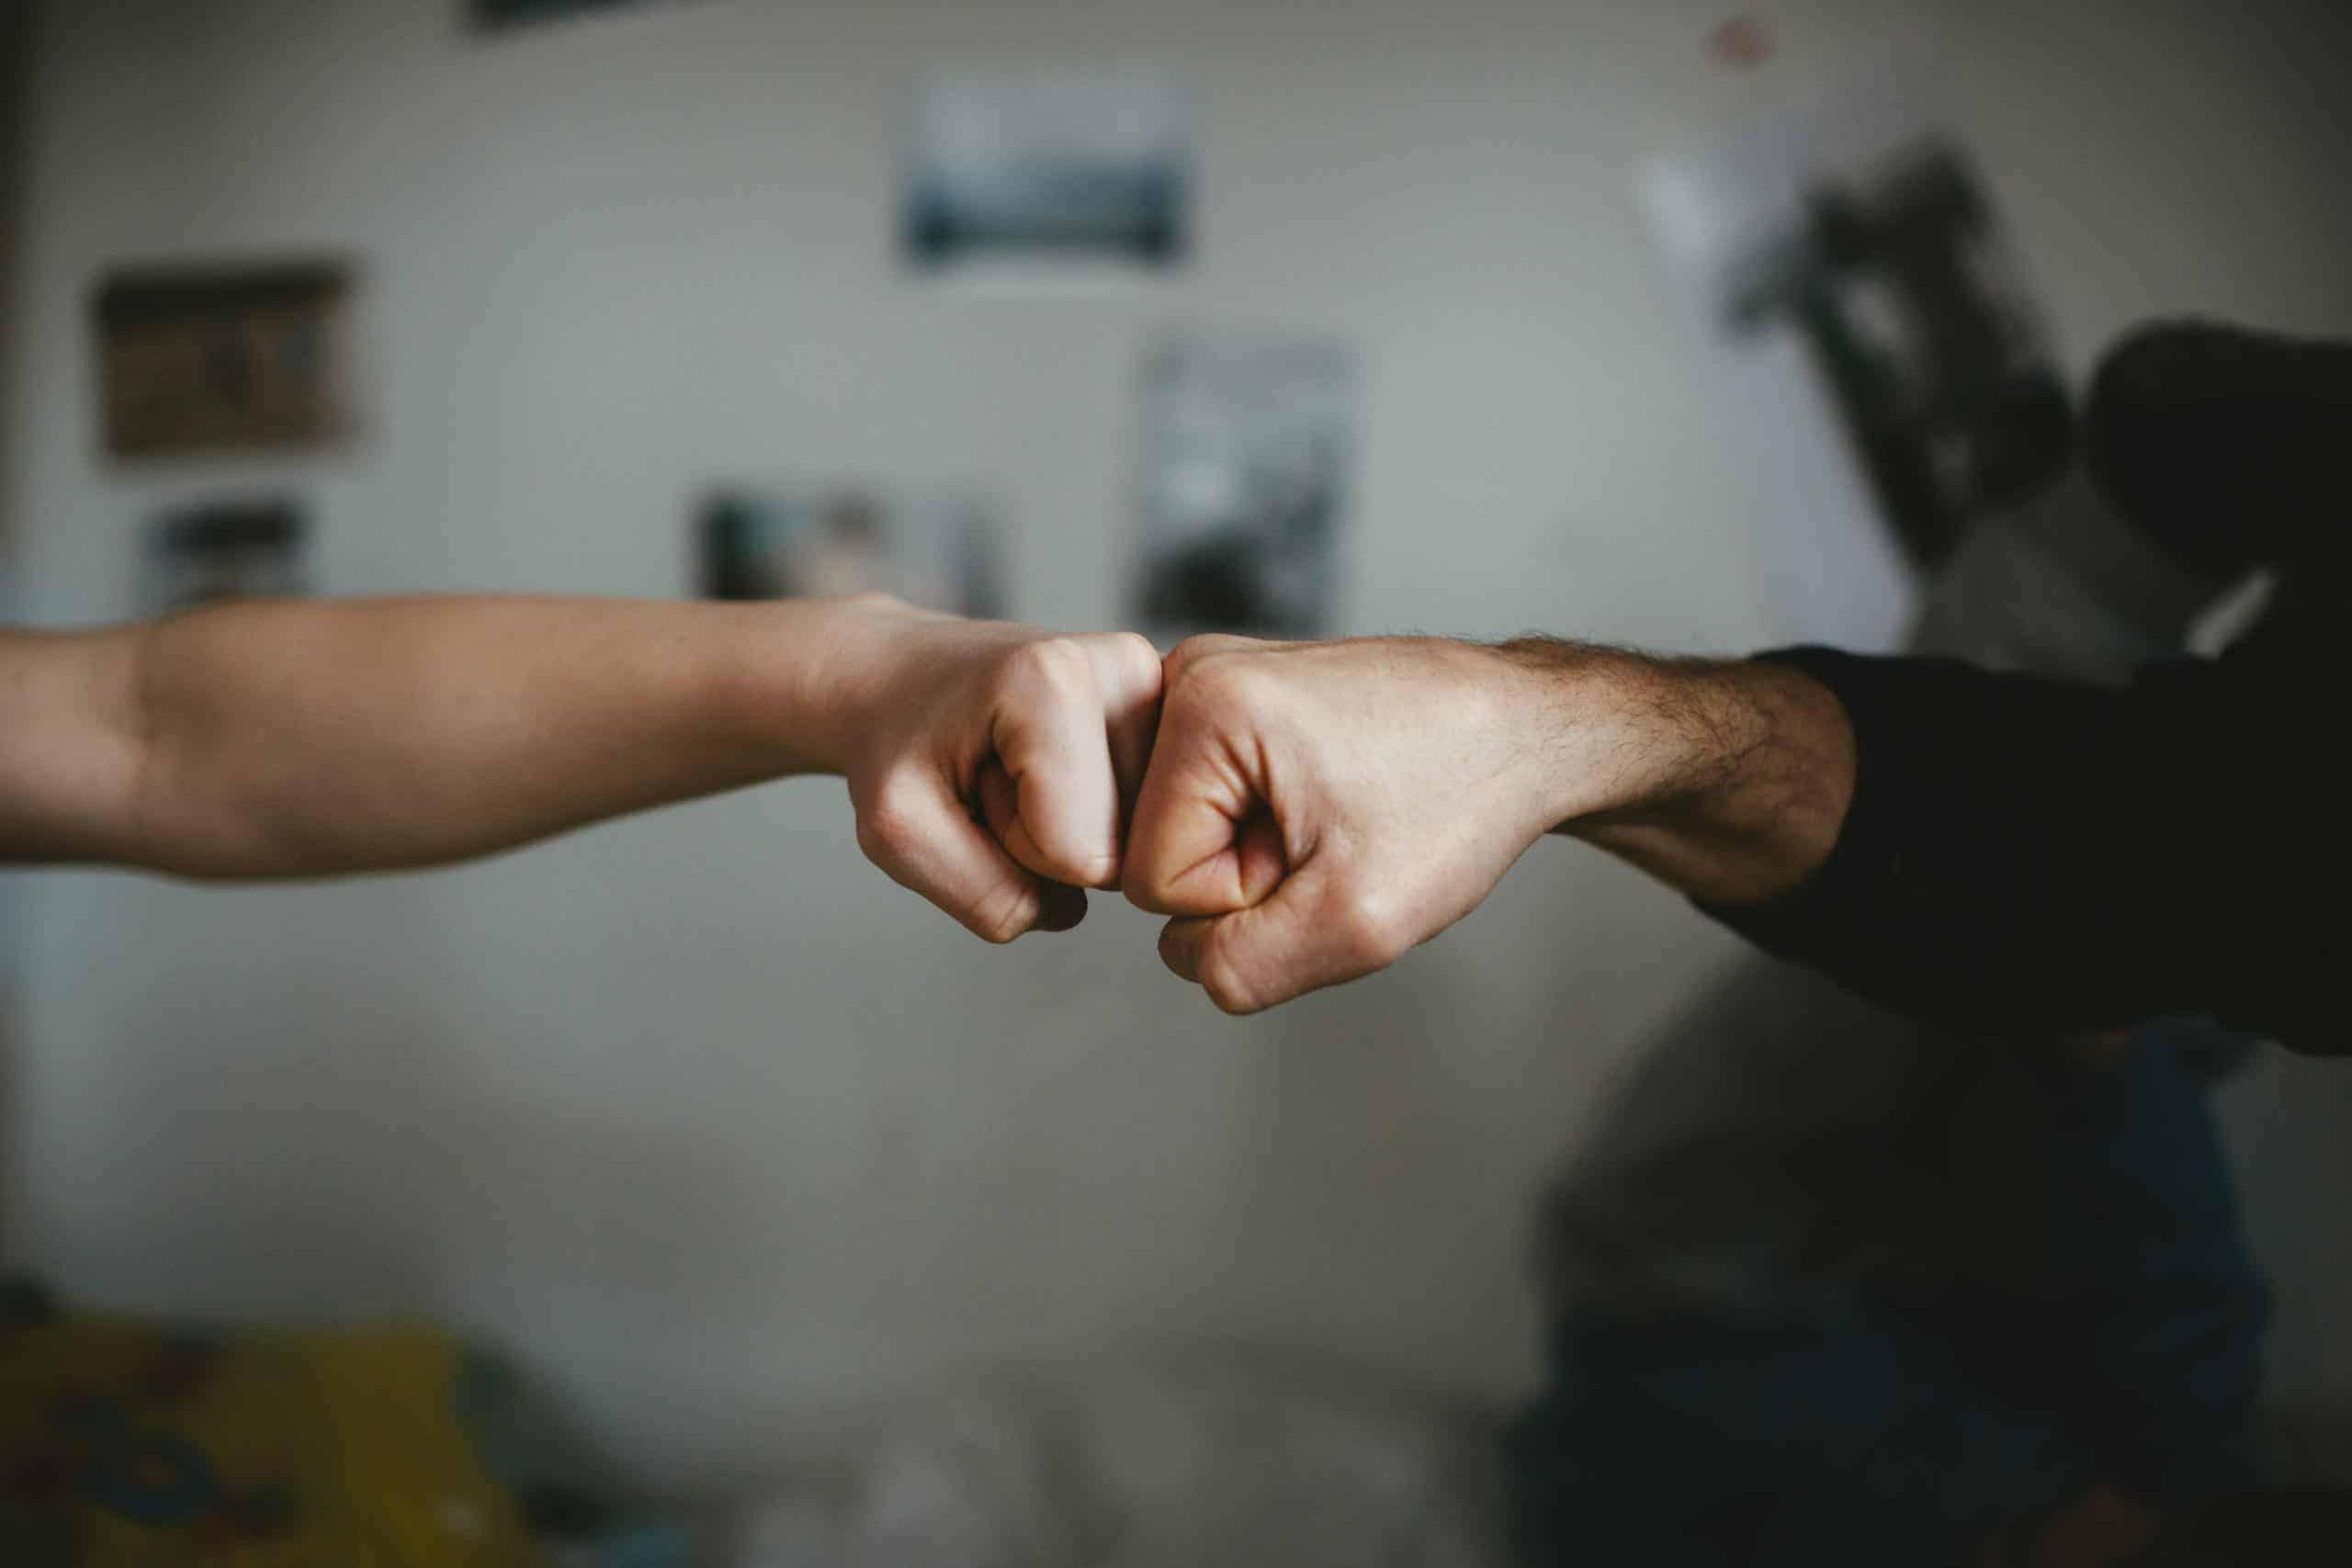 fist bump agreement